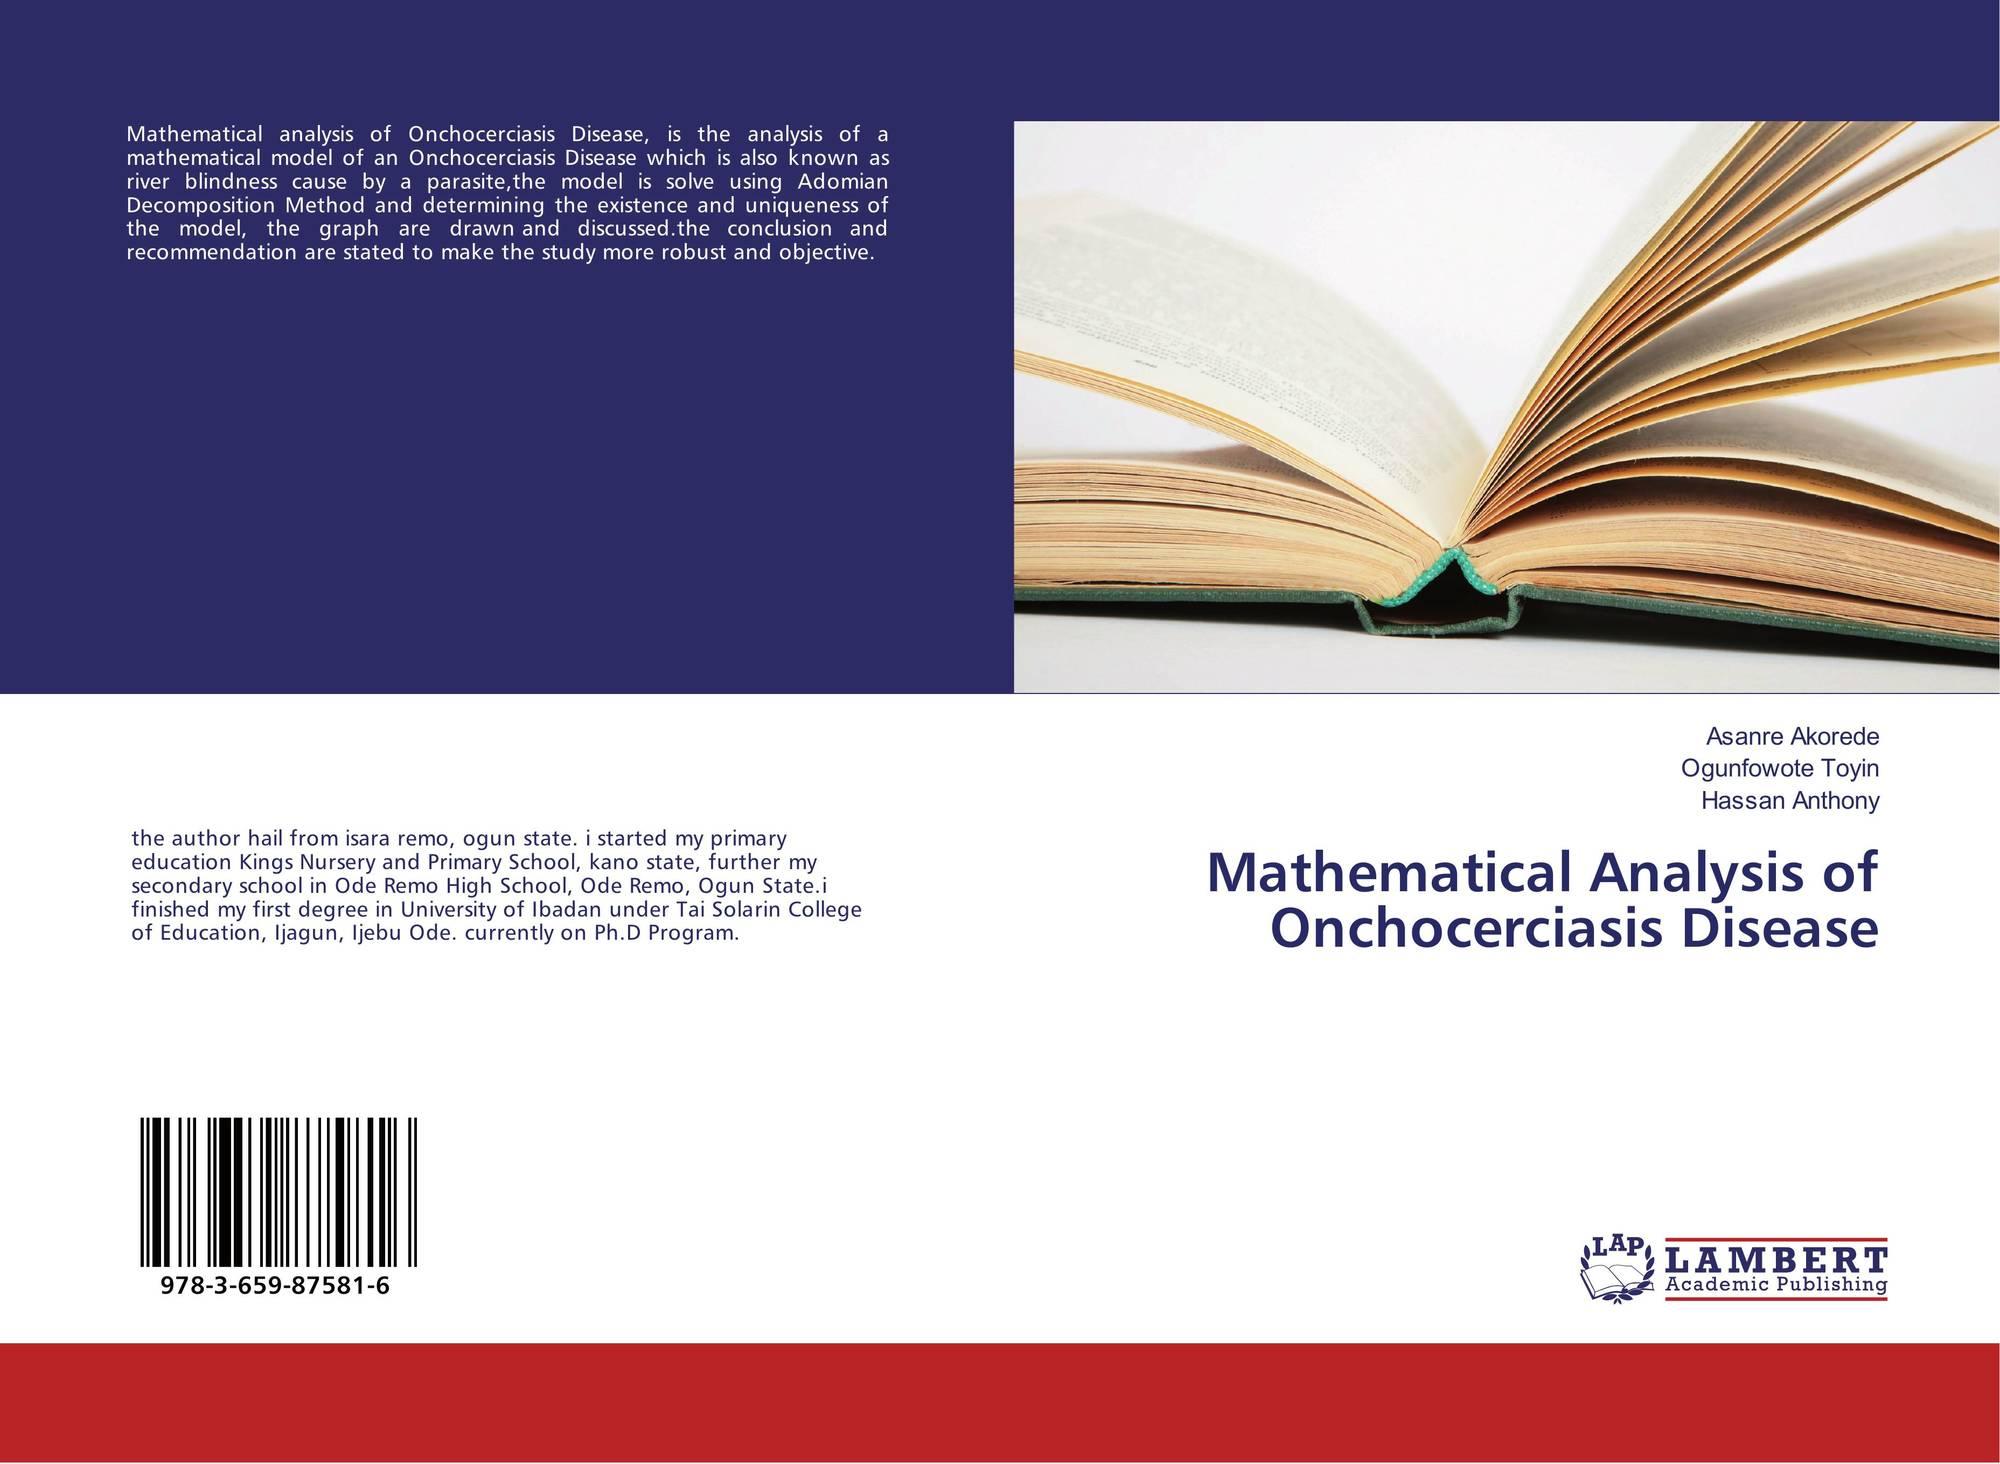 Mathematical Analysis of Onchocerciasis Disease, 978-3-659-87581-6